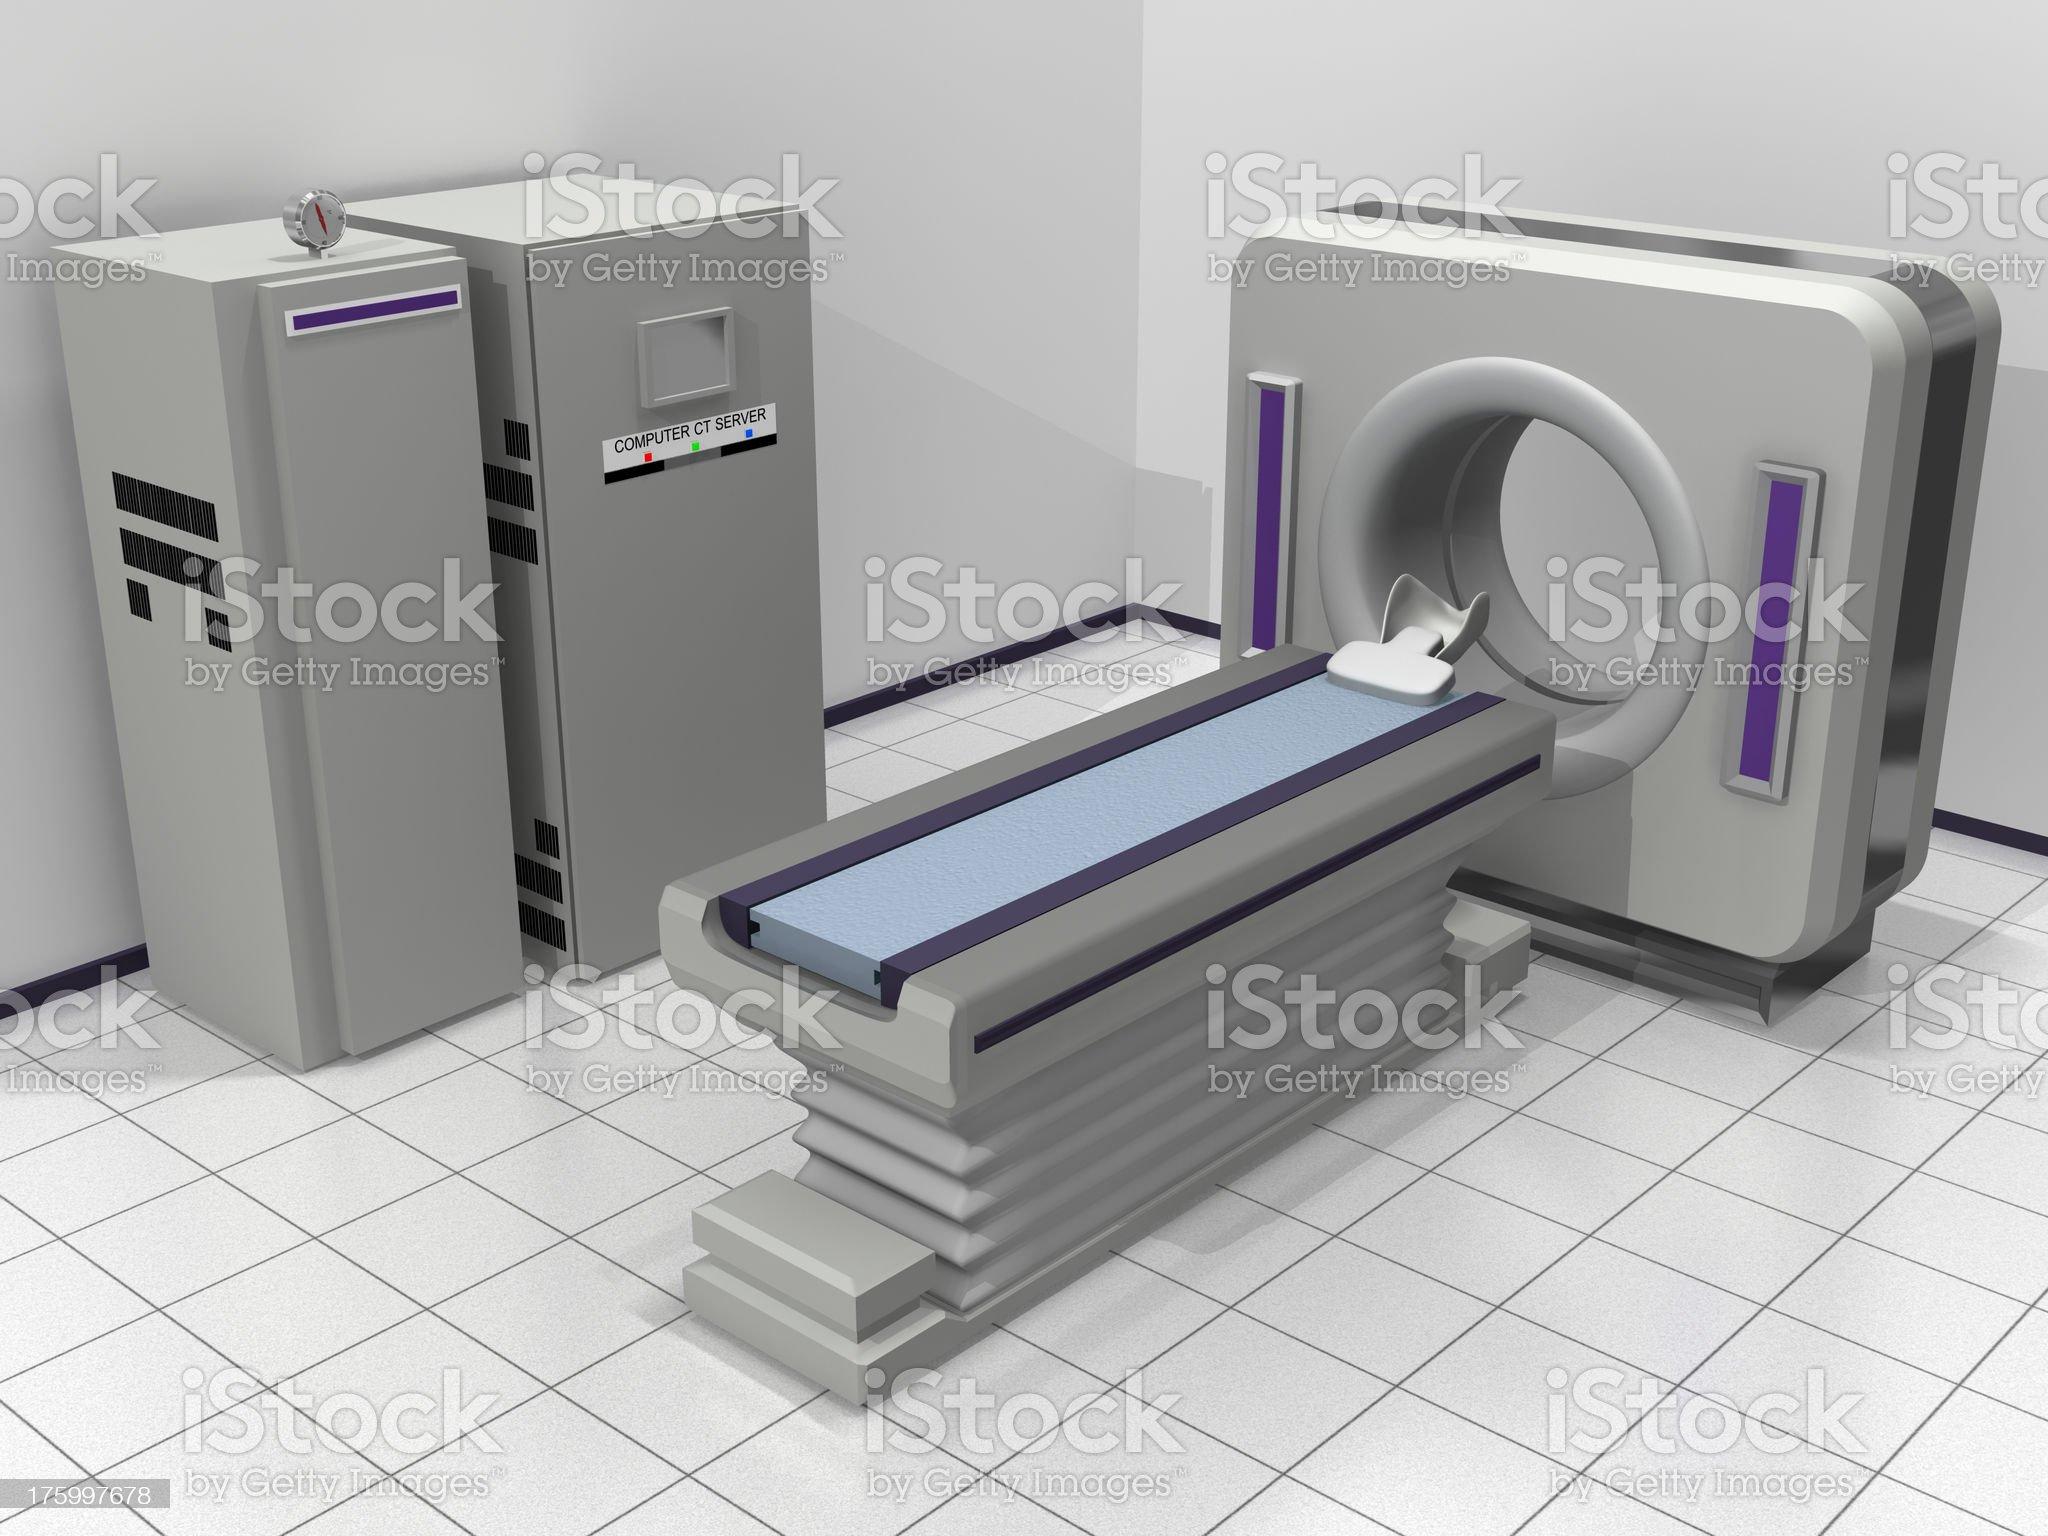 Tomograph Scanner royalty-free stock photo